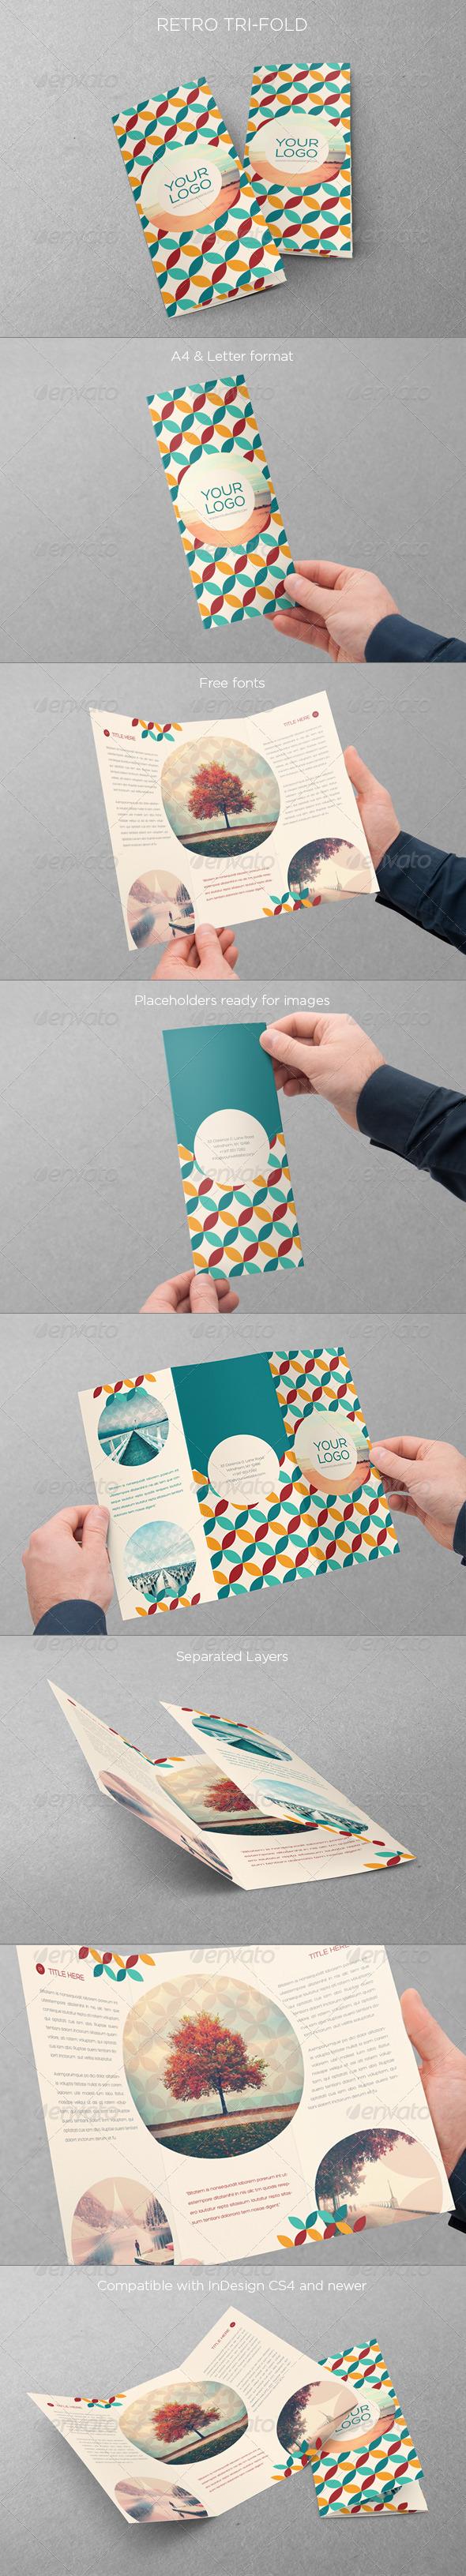 Retro Trifold - Brochures Print Templates